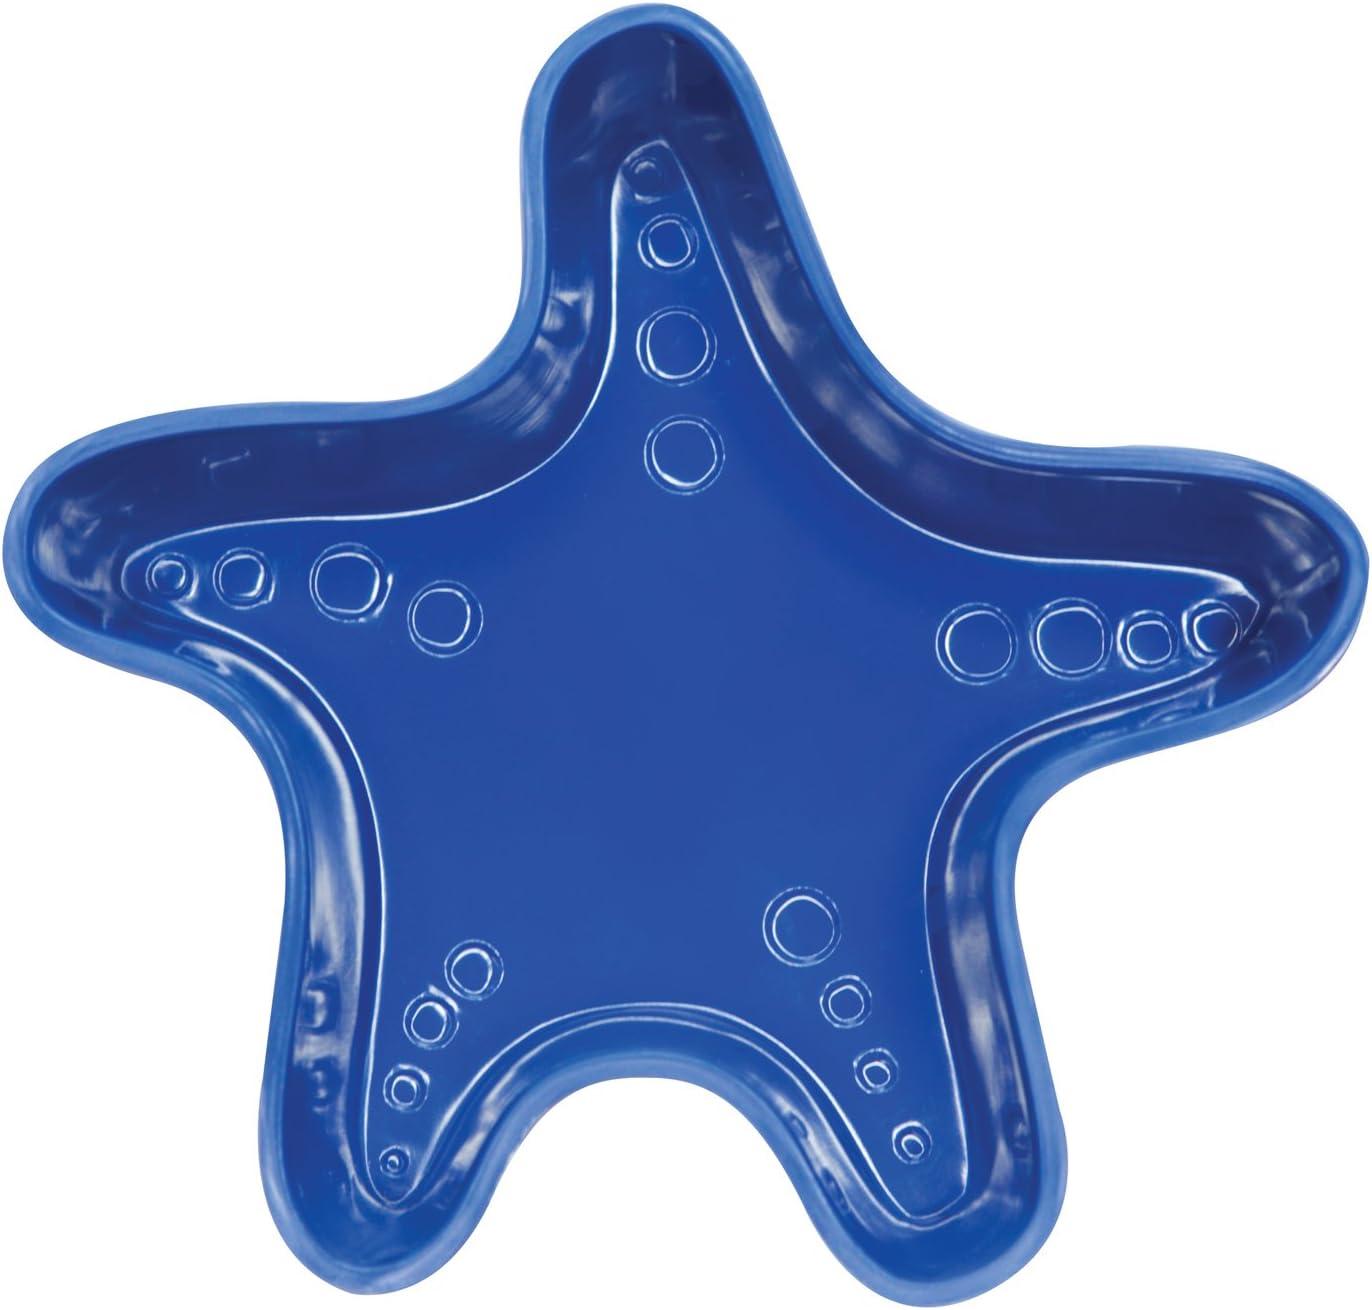 Nantucket Seafood Starfish Sauce Cup 6-Ounce Blue